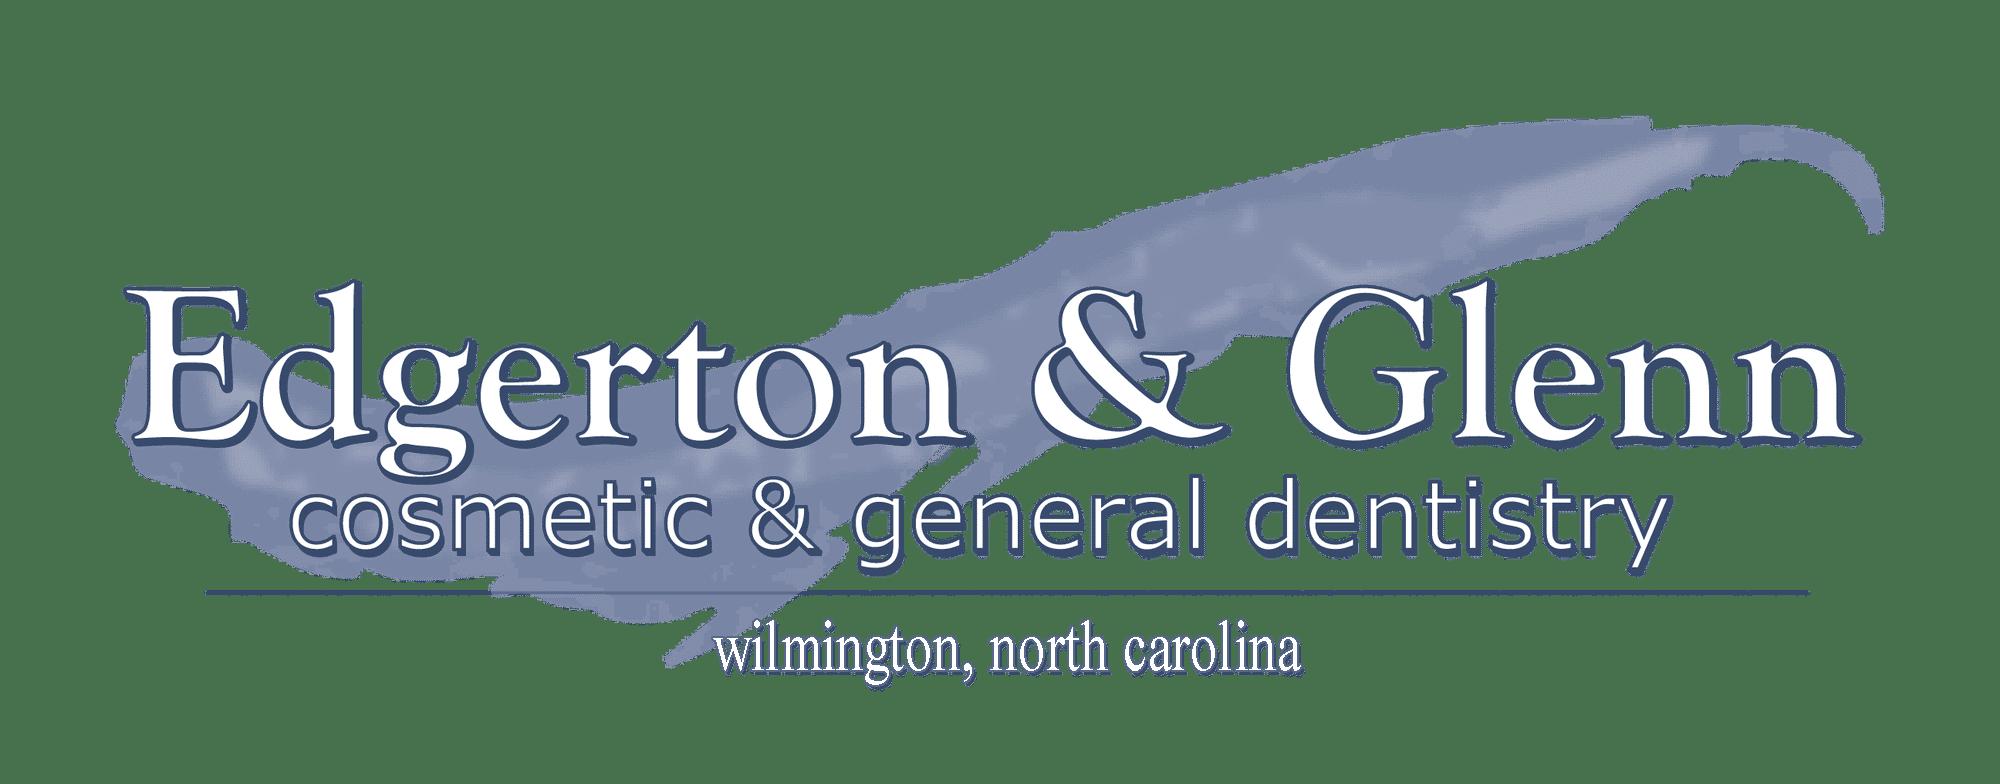 edgerton-glenn-logo-wilmington-nc-transparent